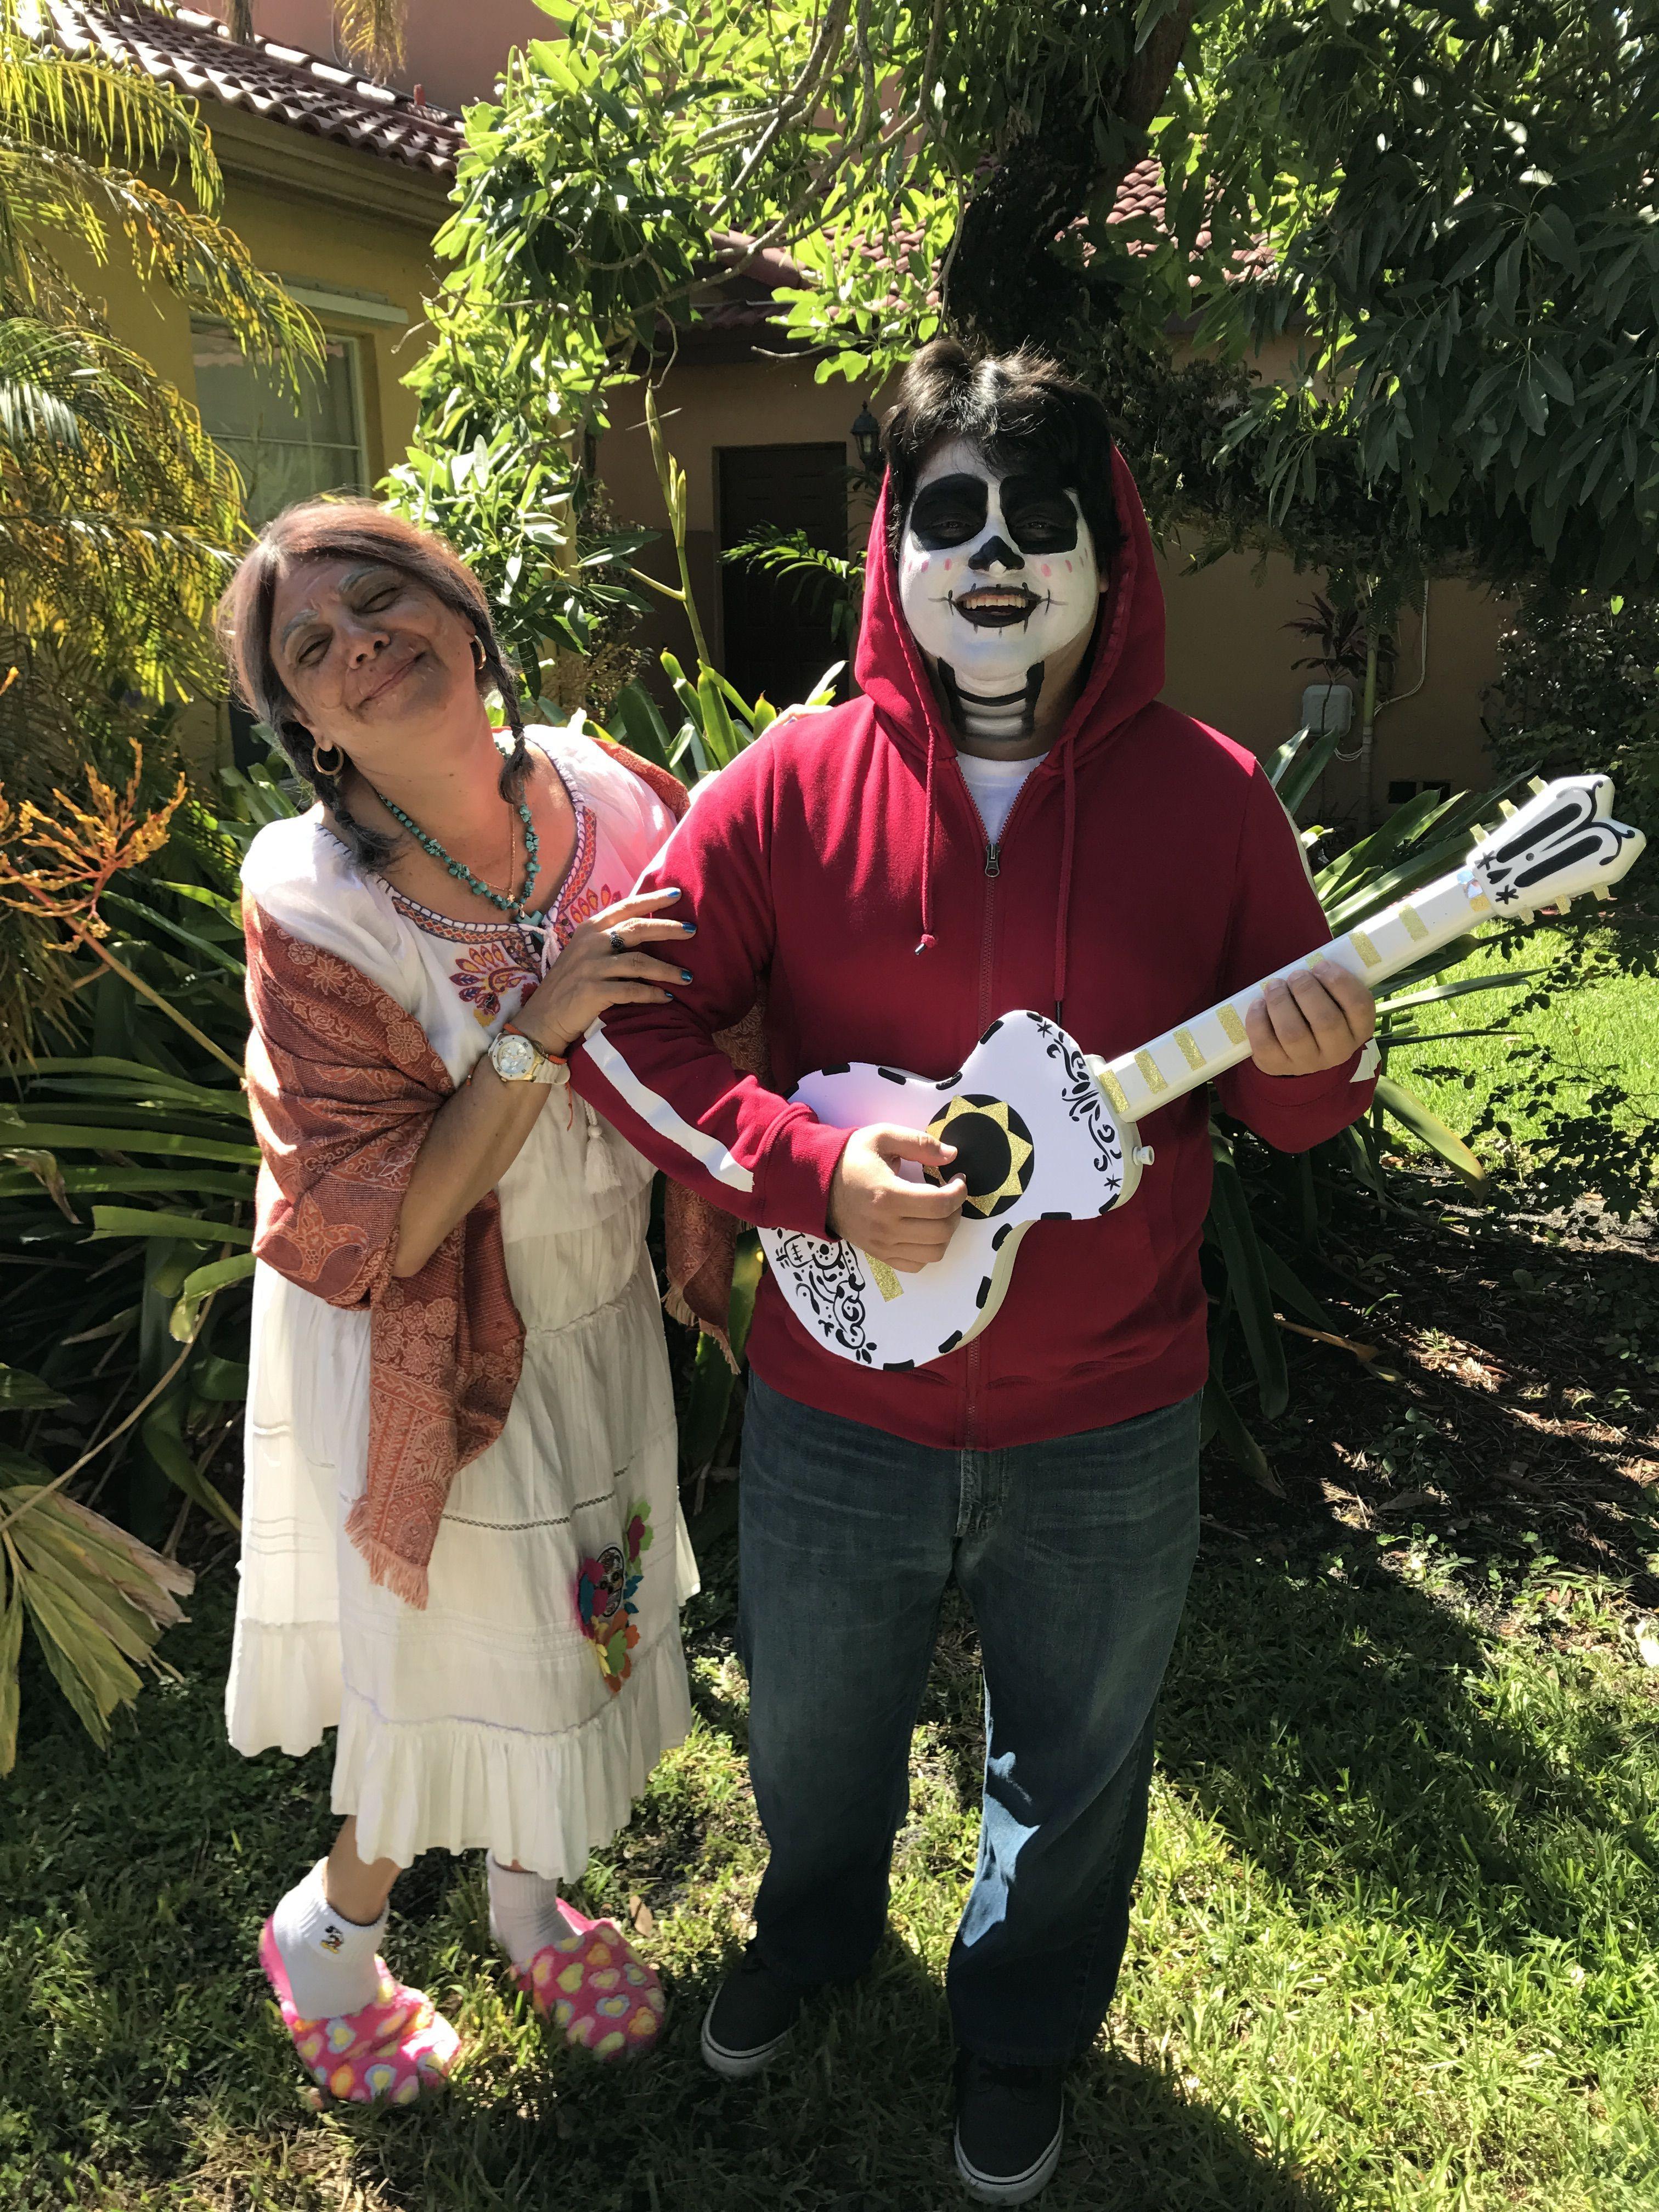 Miguel Halloween Costume Twitter user Alex (a_torres_51